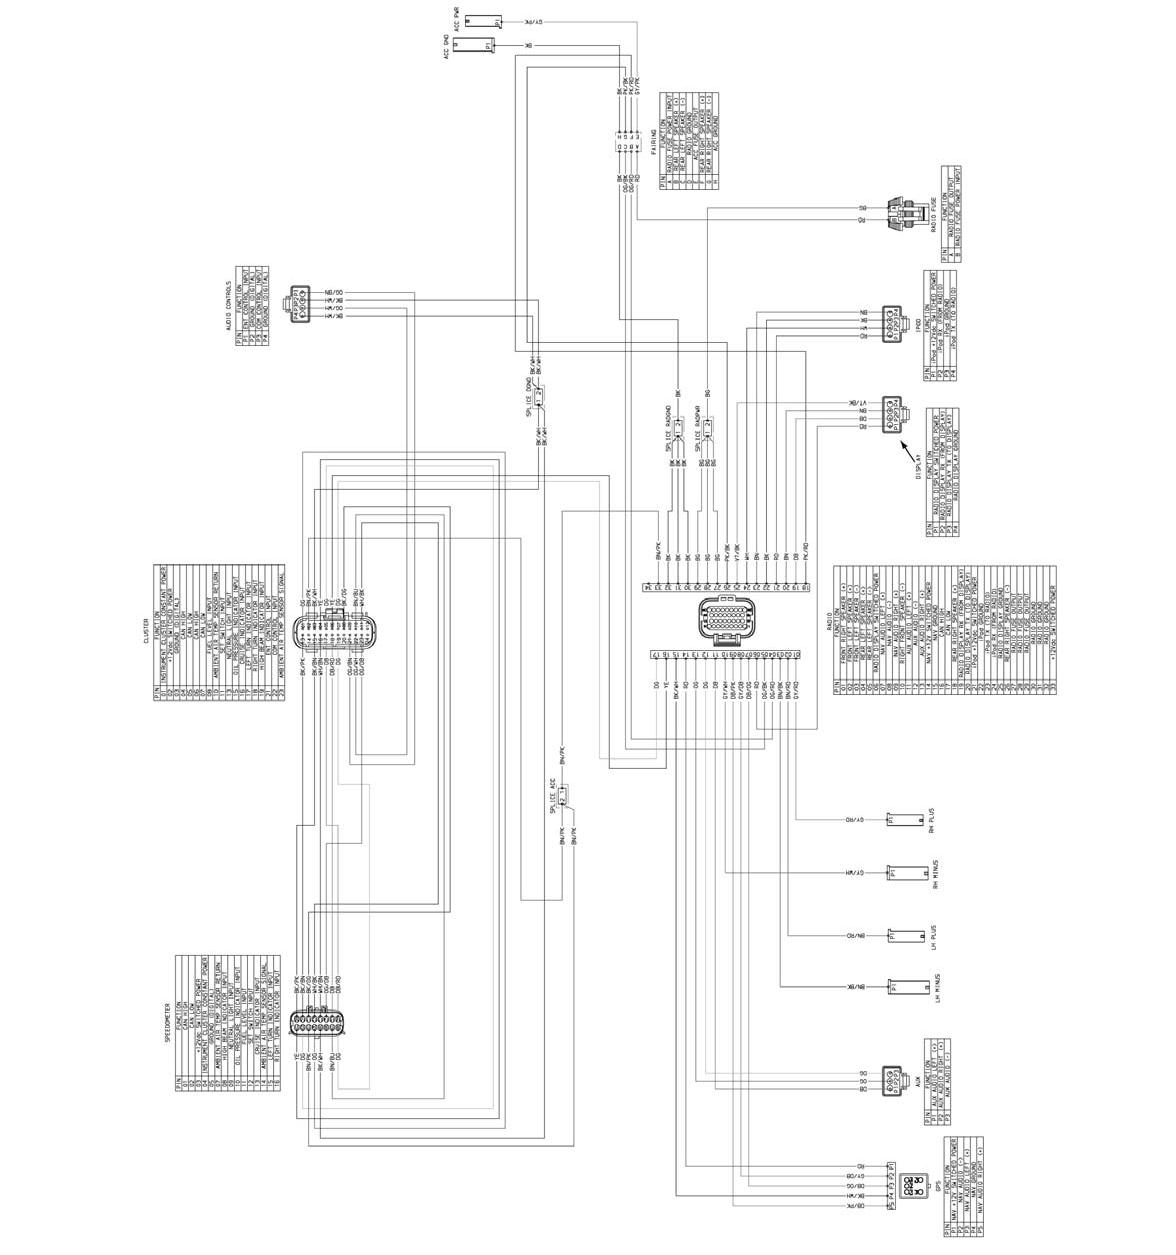 [DIAGRAM_09CH]  Victory Radio Wiring - Usb On The Go Wiring Diagram for Wiring Diagram  Schematics | Victory V92sc Wiring Schematics Free |  | Wiring Diagram Schematics